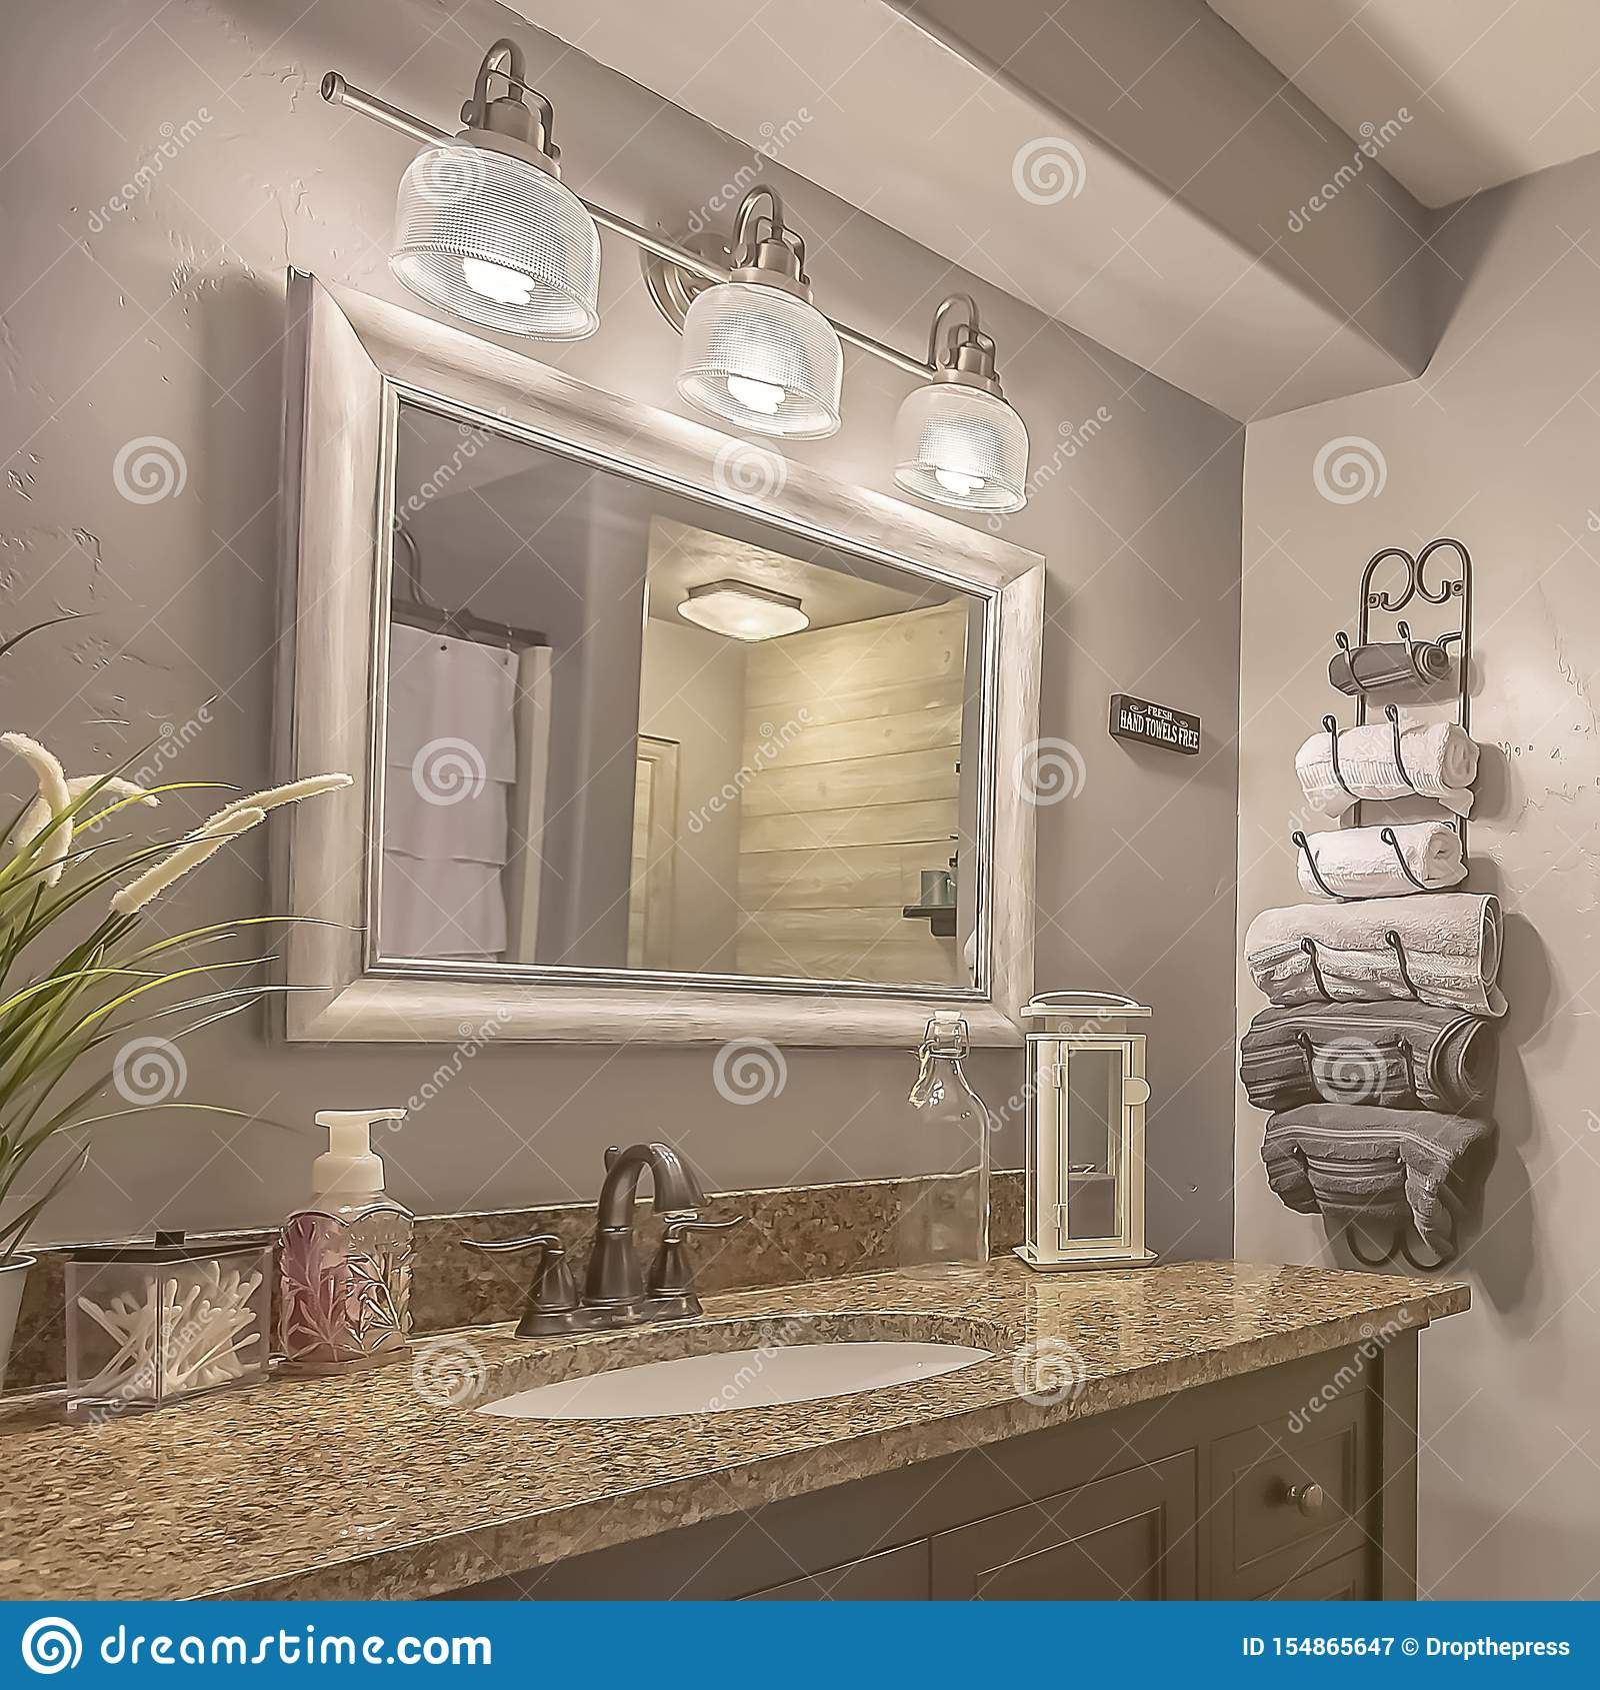 https www dreamstime com square frame mirror lamps above vanity inside bathroom towel rack shelves white curtain conceals bathtub shower image154865647